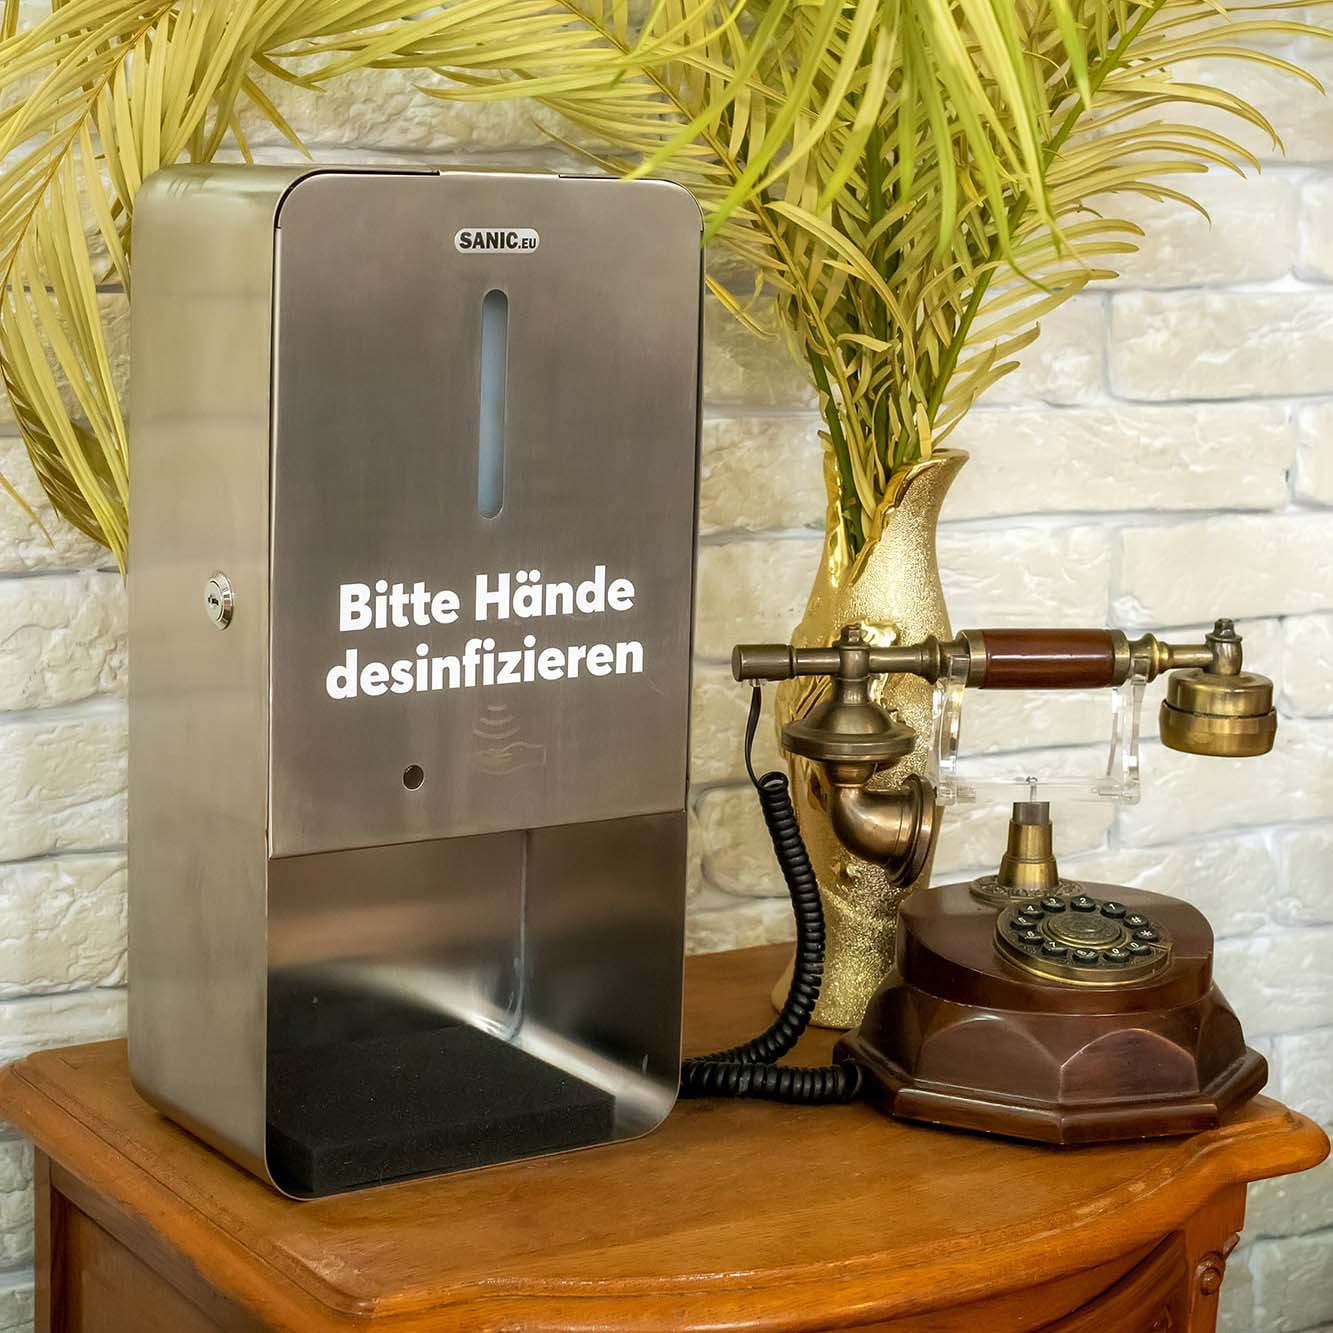 SANIC Edelstahl Tisch-Desinfektionsstation mit Sensor